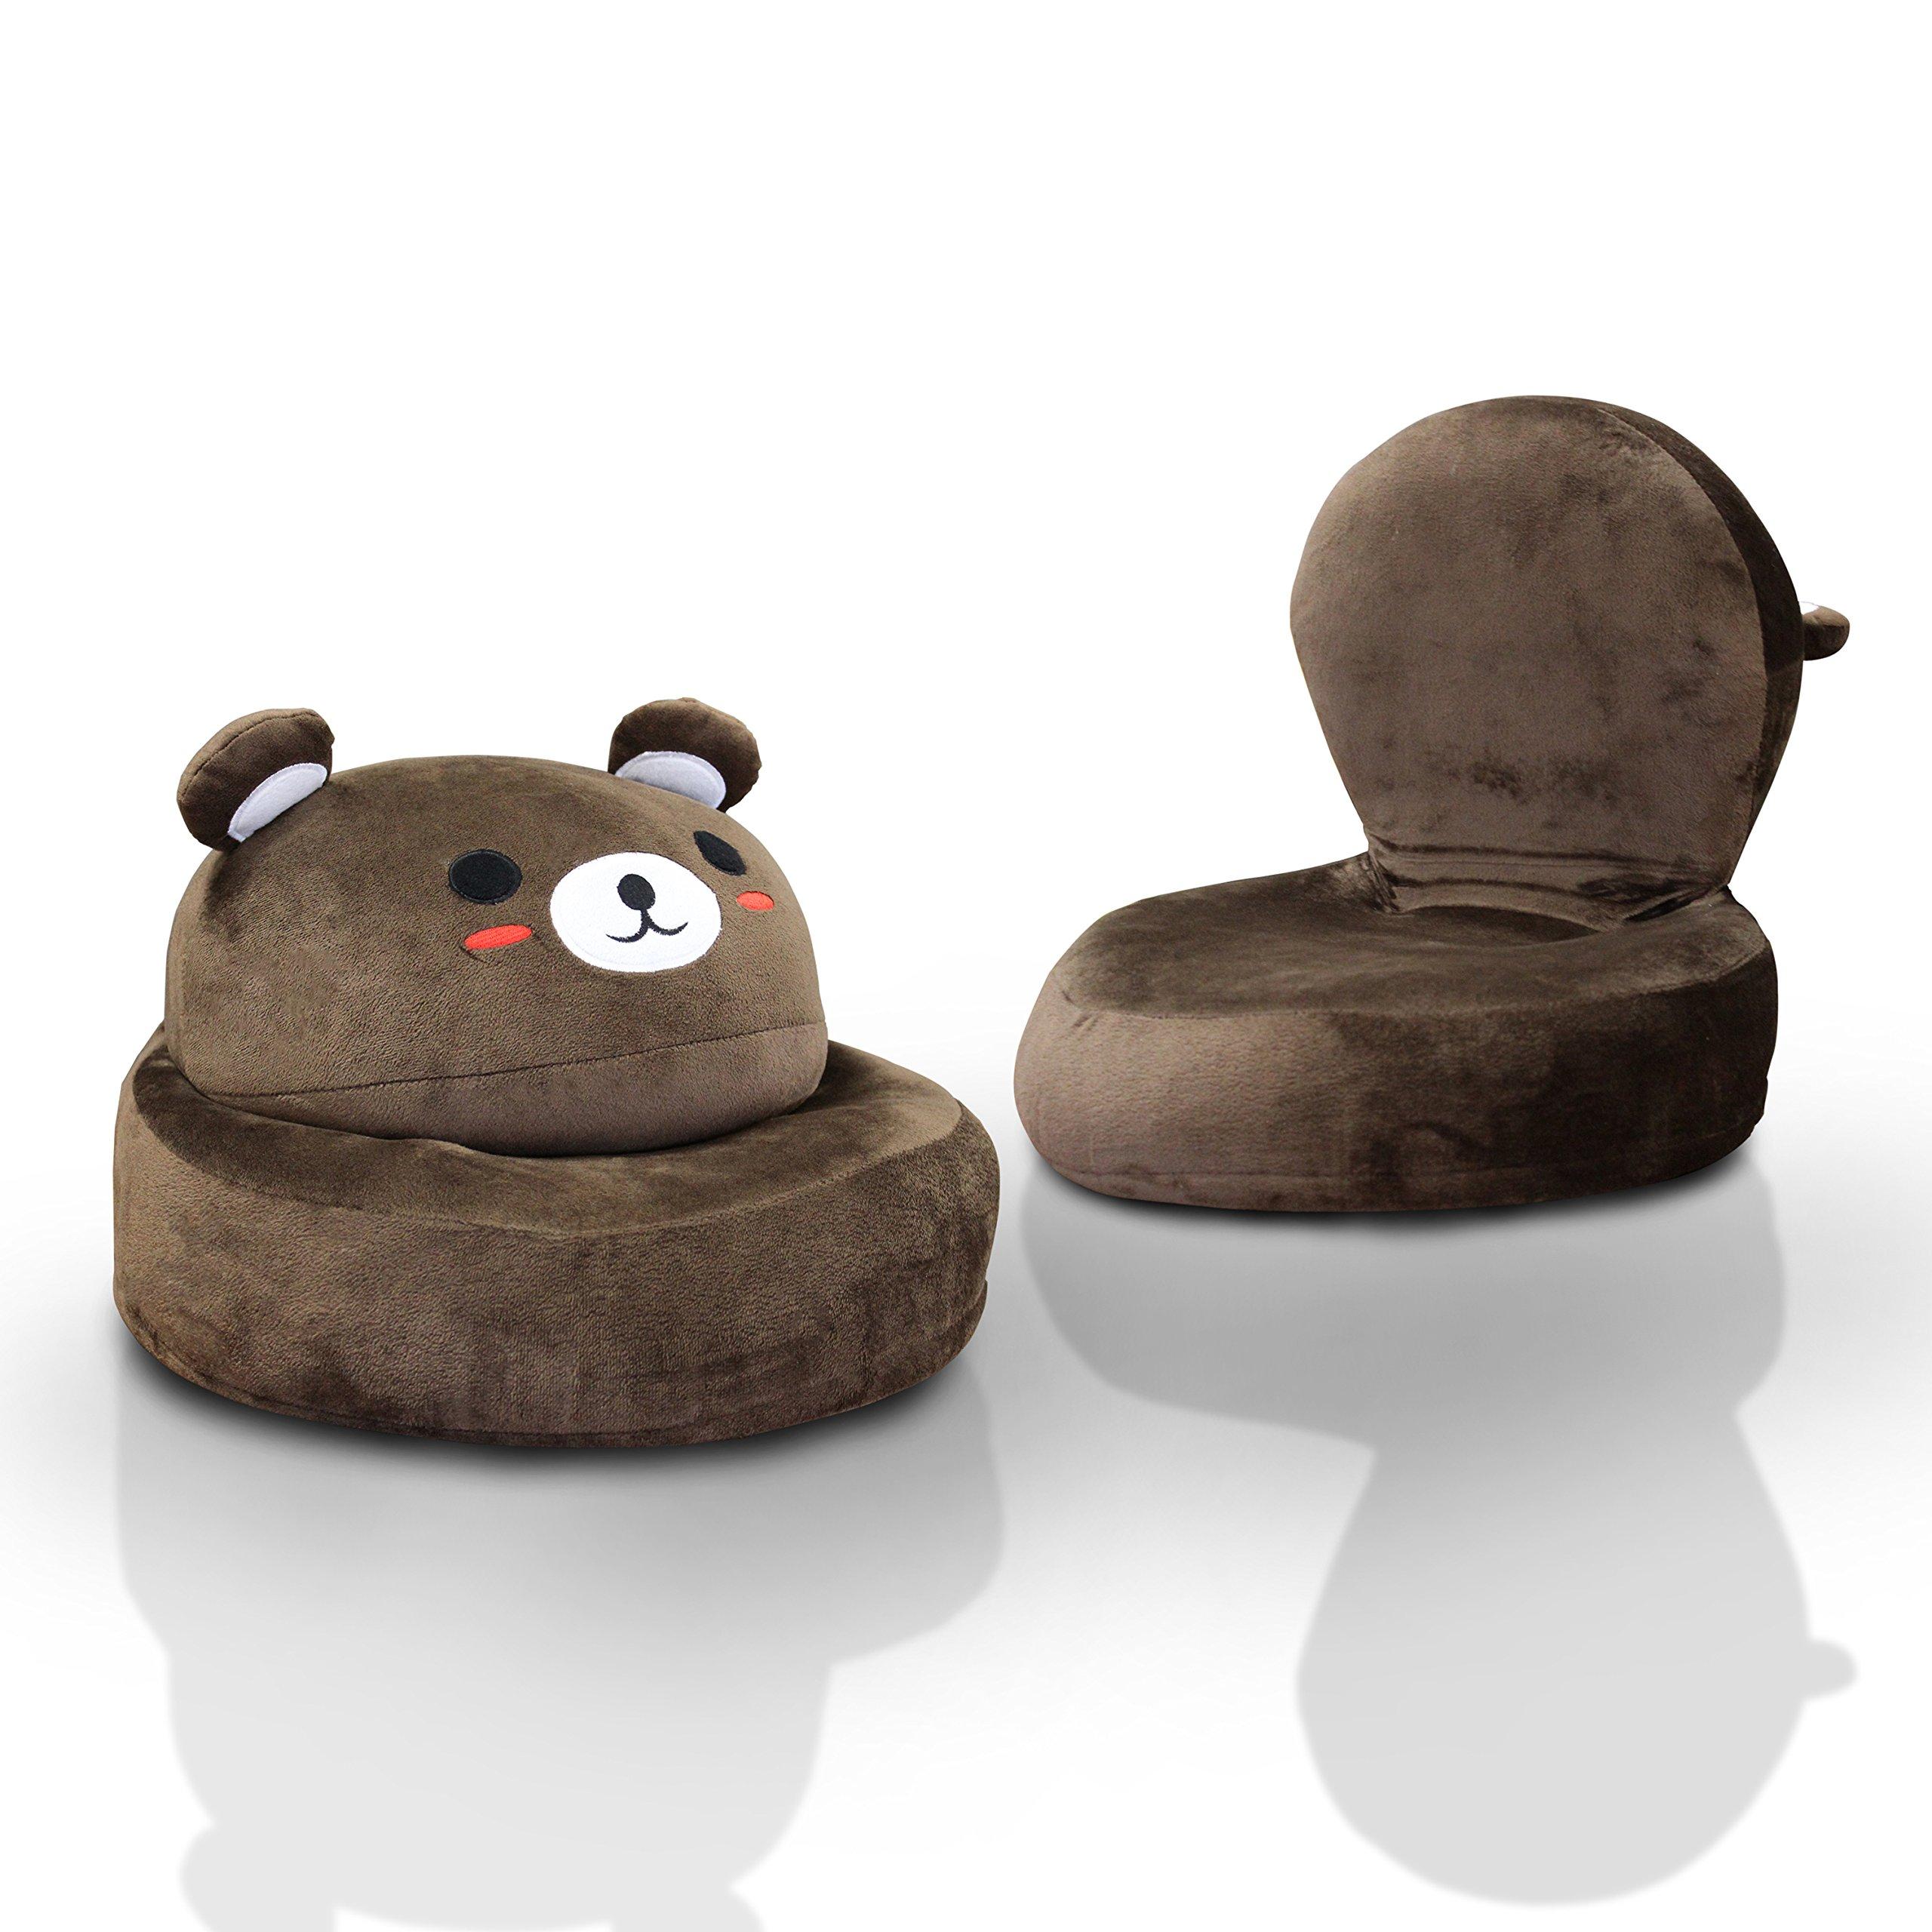 247SHOPATHOME Bear Childrens-Folding-Chairs, Orange